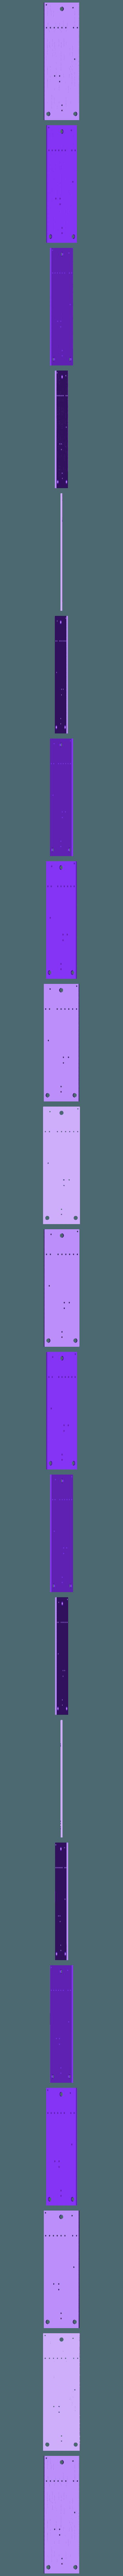 board_105B.stl Download free STL file Turn Table for ObjectVR • 3D printable model, tofuji